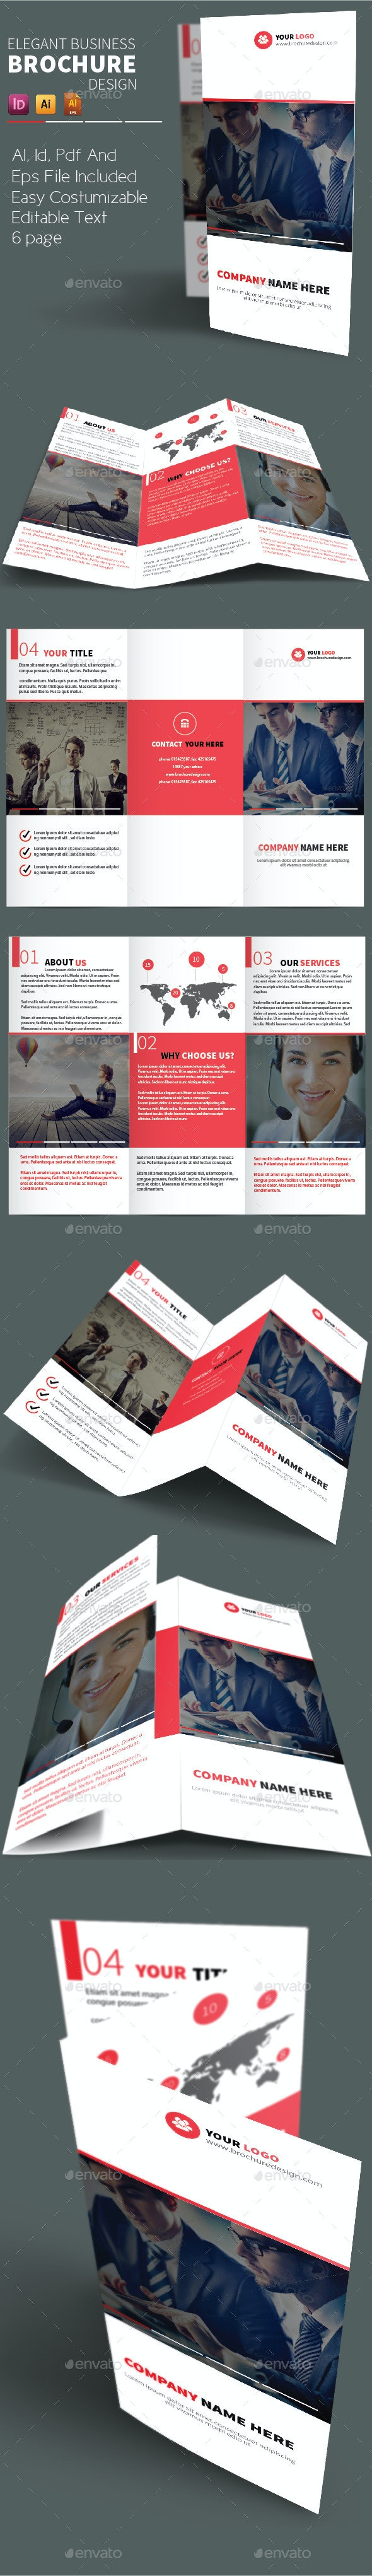 Elegant Business Brochure Design - Brochures Print Templates